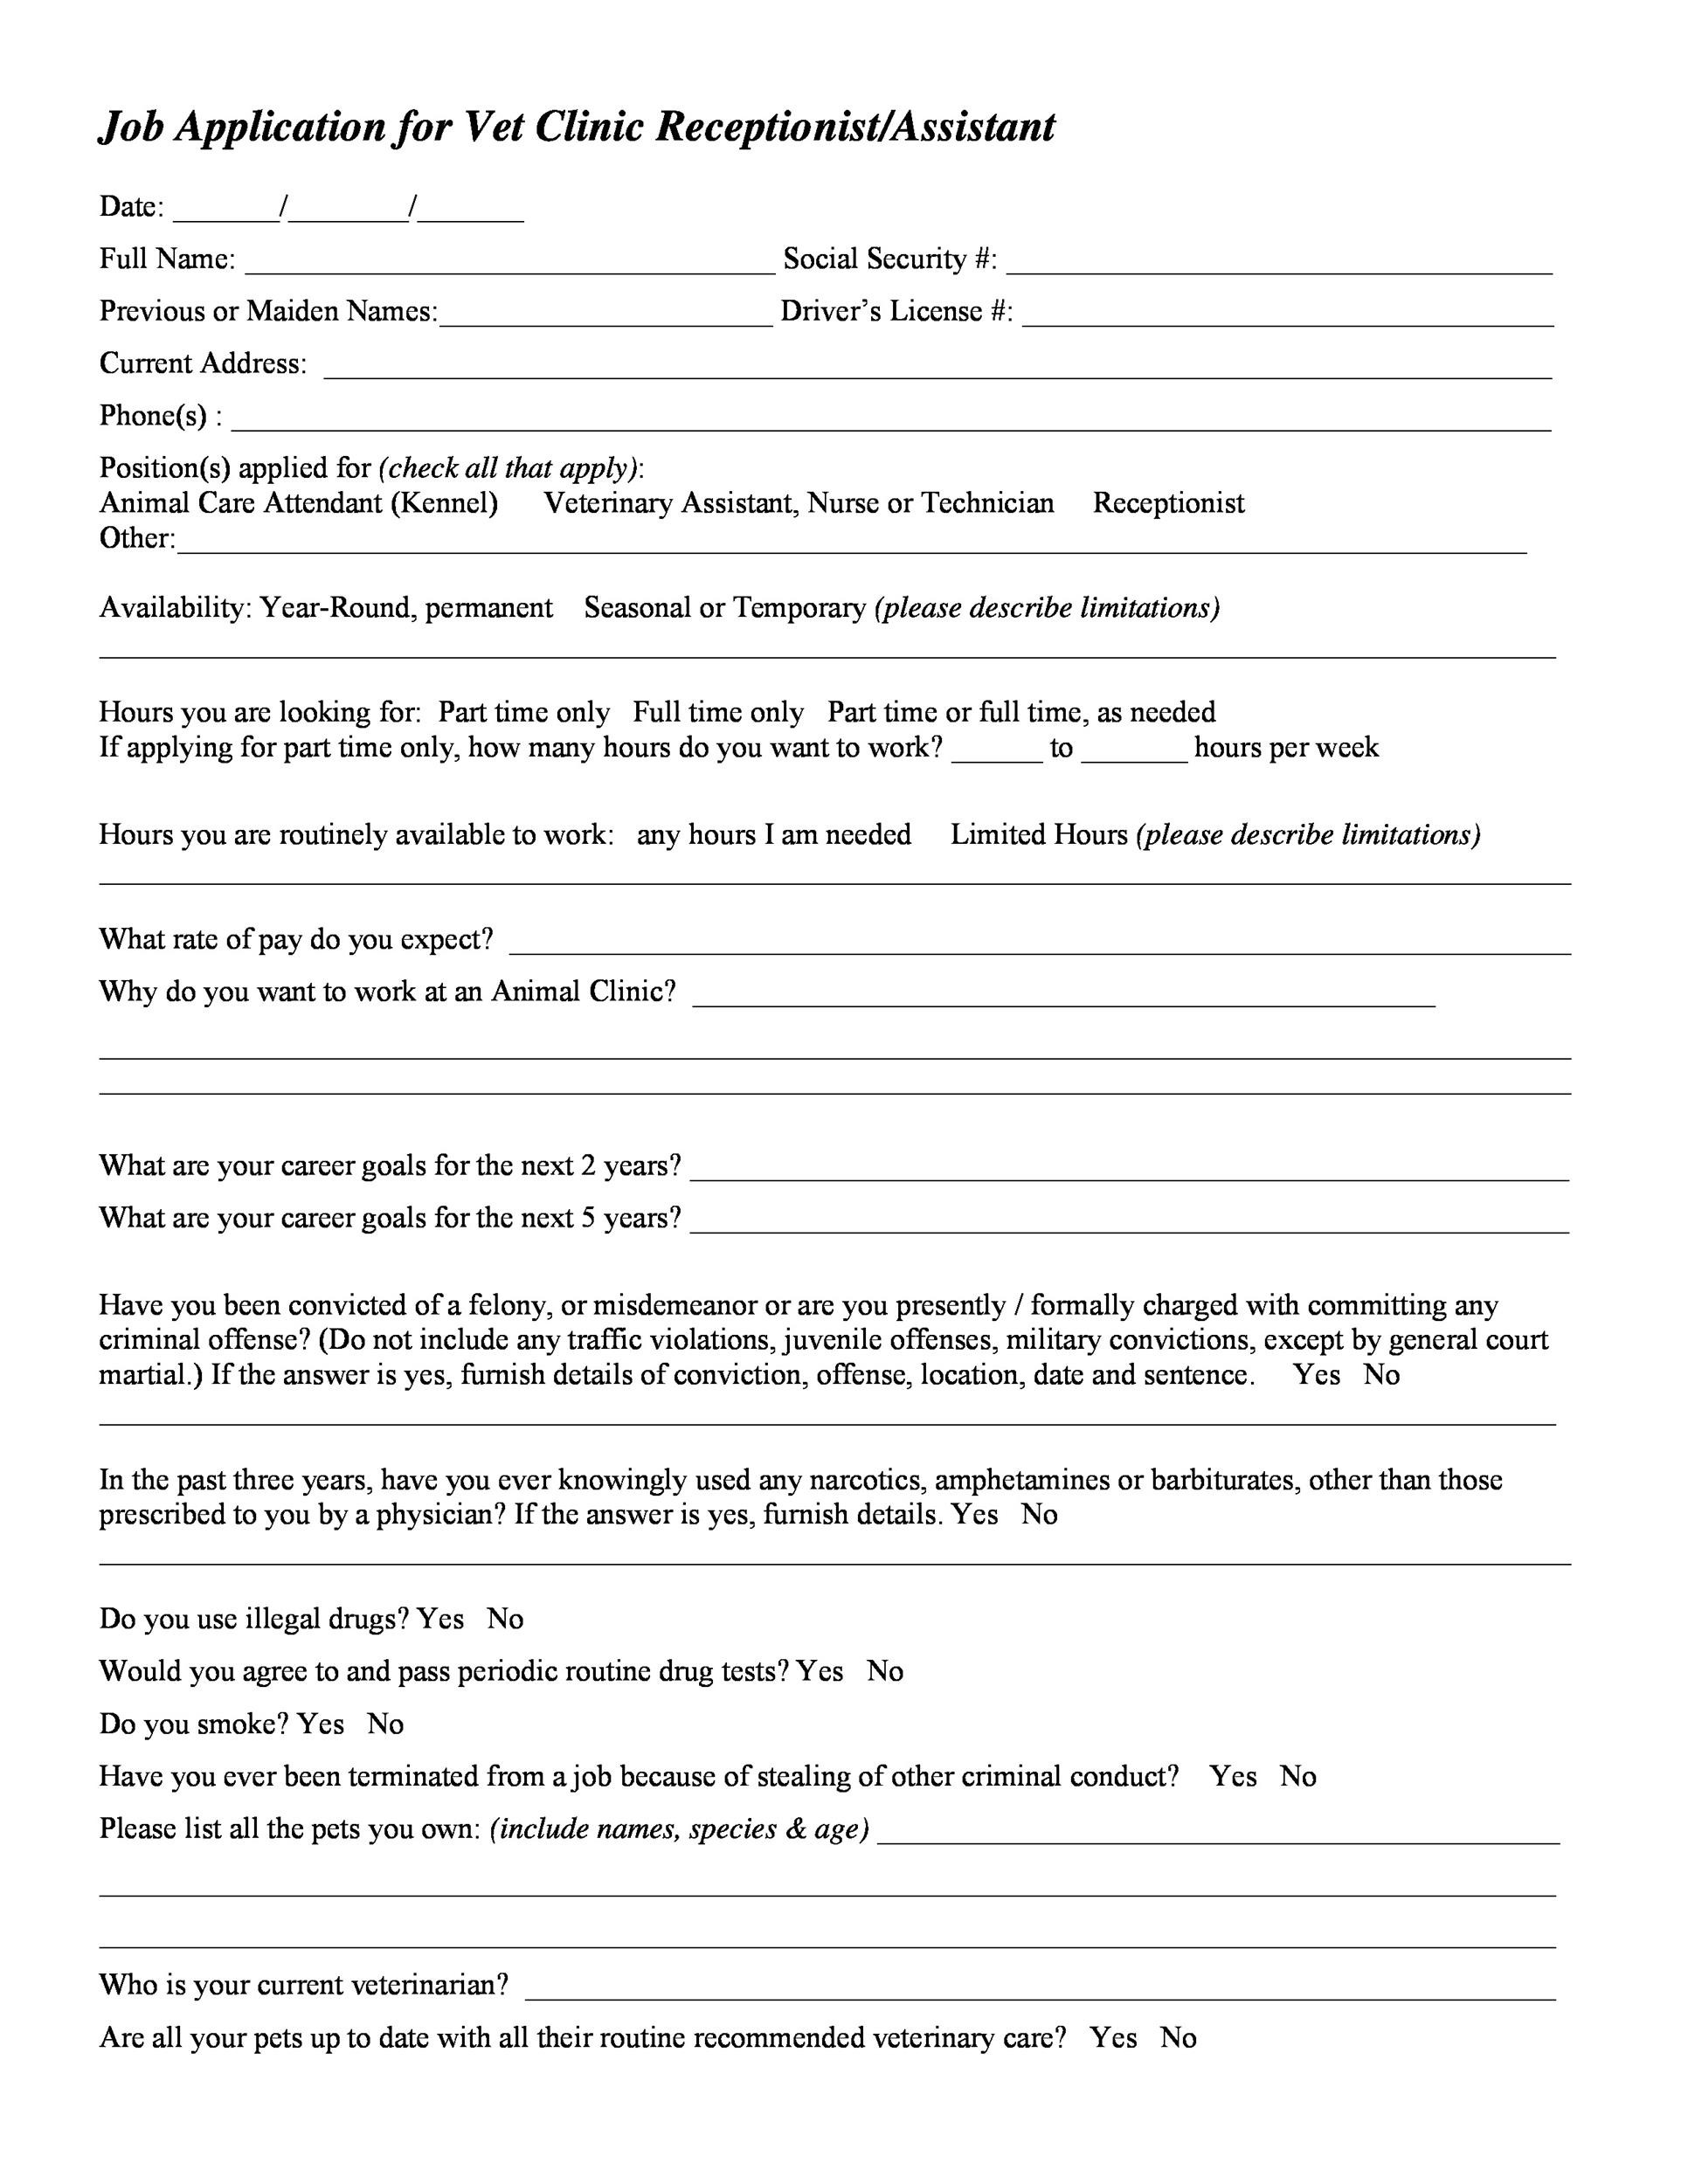 Personal information (1) applicant name. 50 Free Employment Job Application Form Templates Printable Á… Templatelab